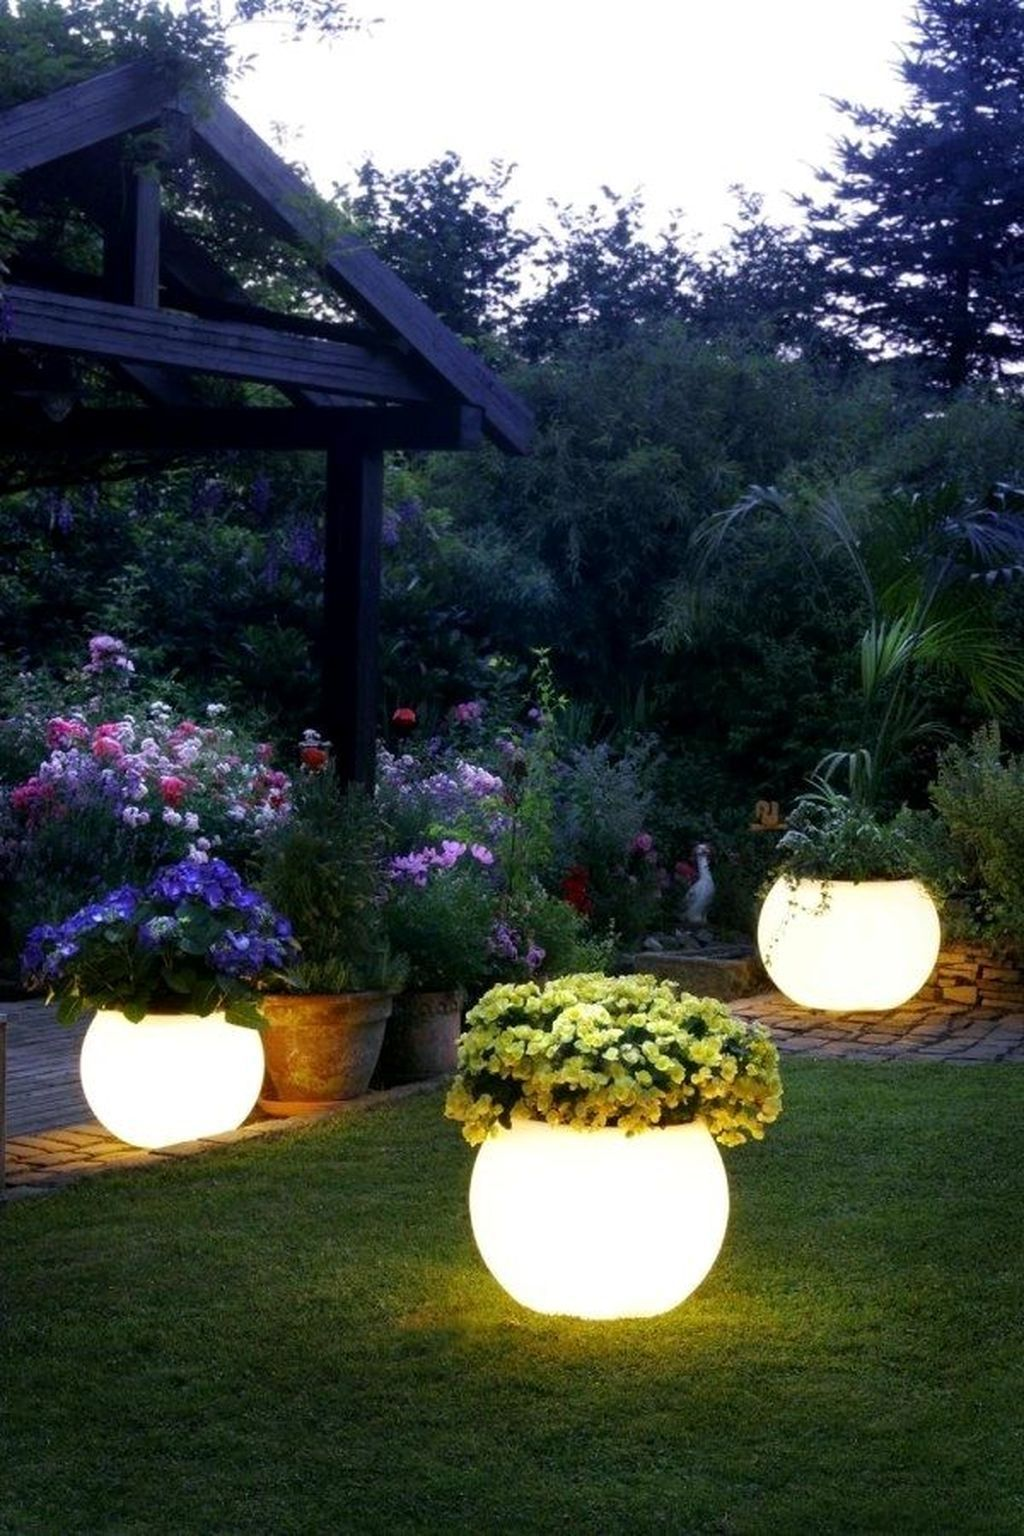 20 Beautiful Light Design Ideas For Garden In 2020 Outdoor Garden Lighting Backyard Landscaping Garden Landscaping Diy